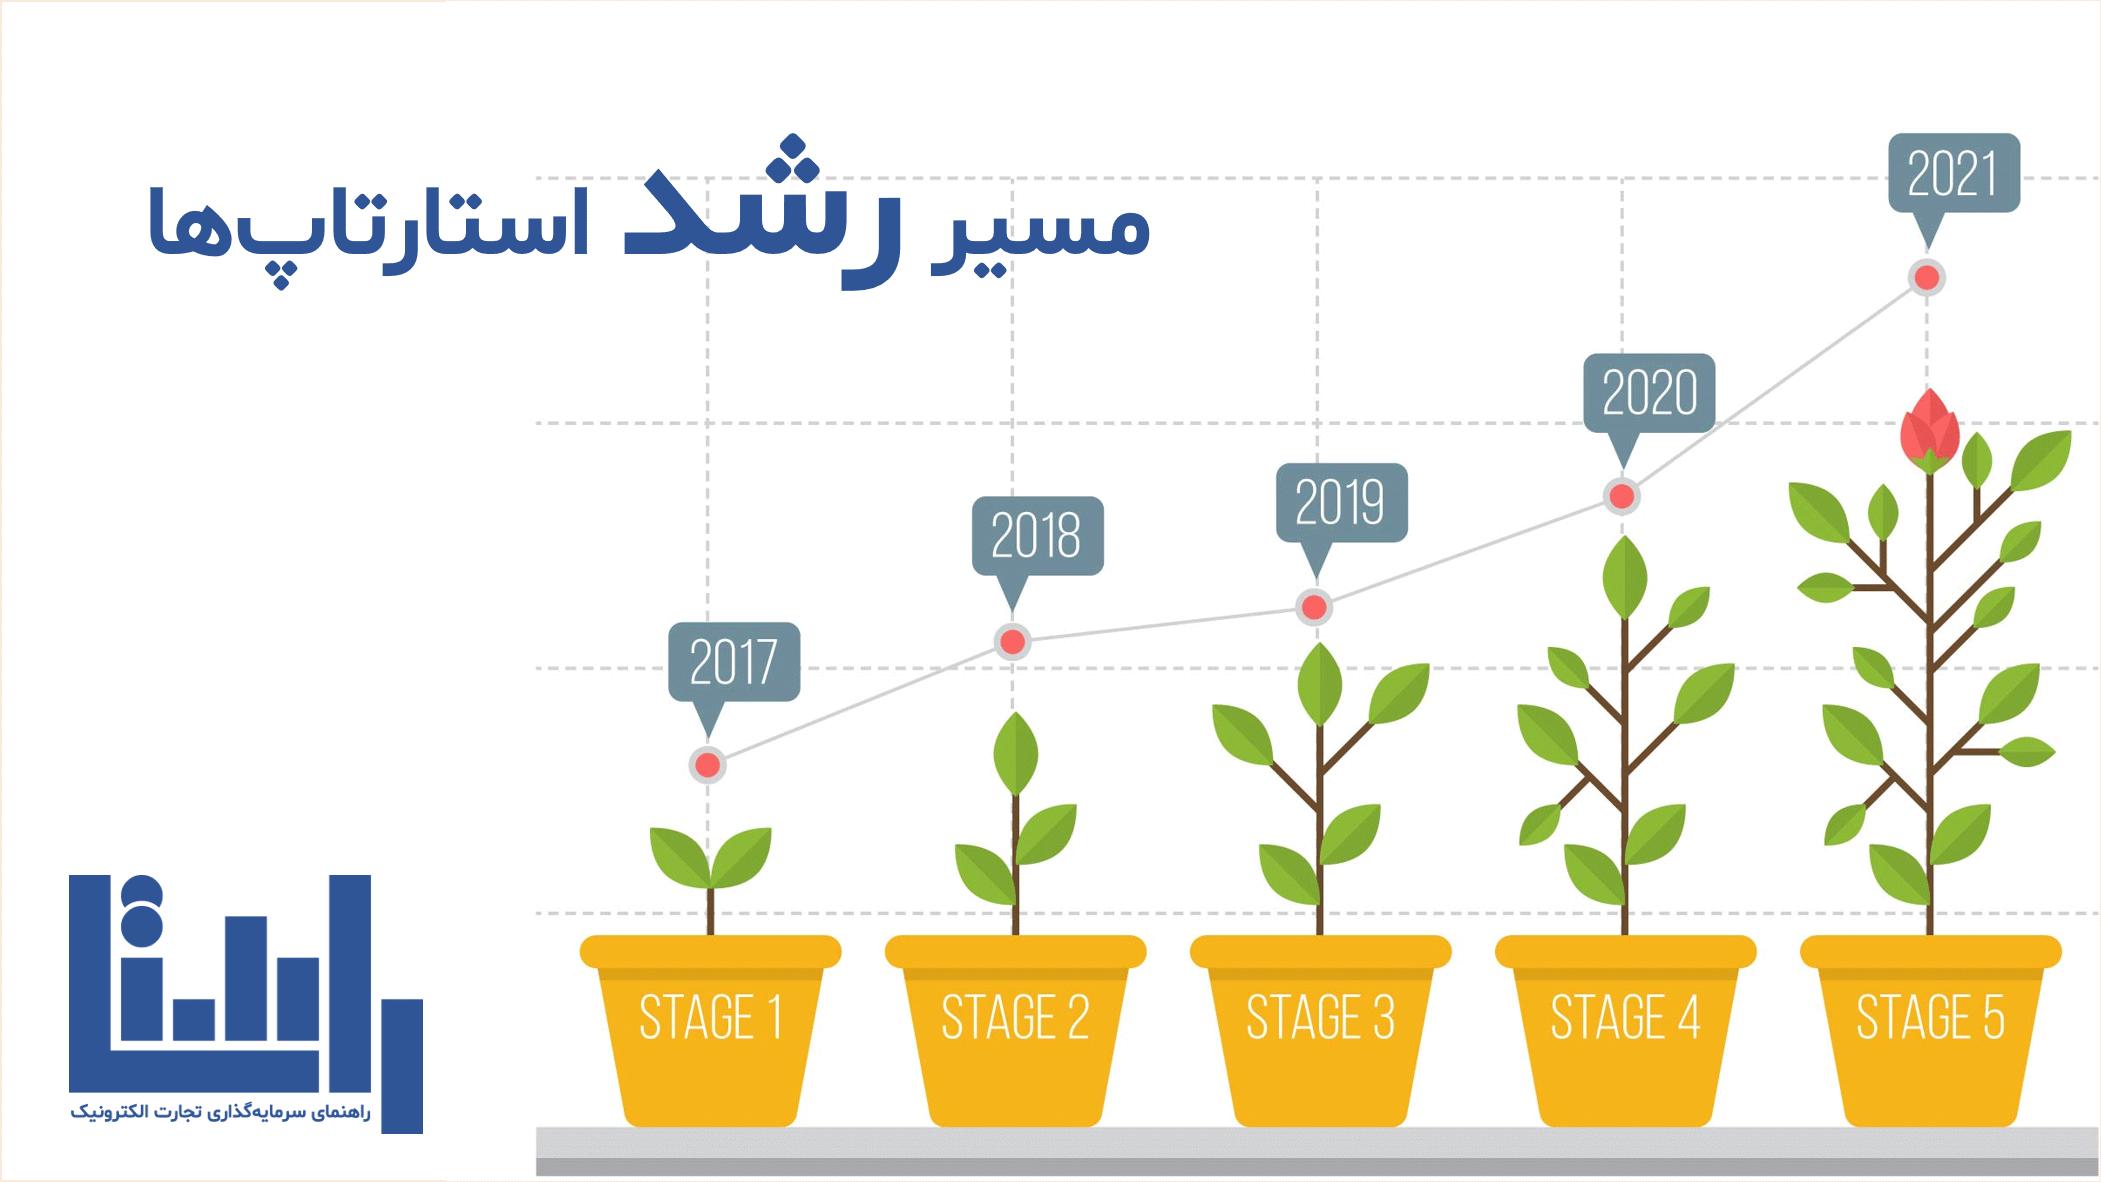 مسیر رشد استارتاپ ها